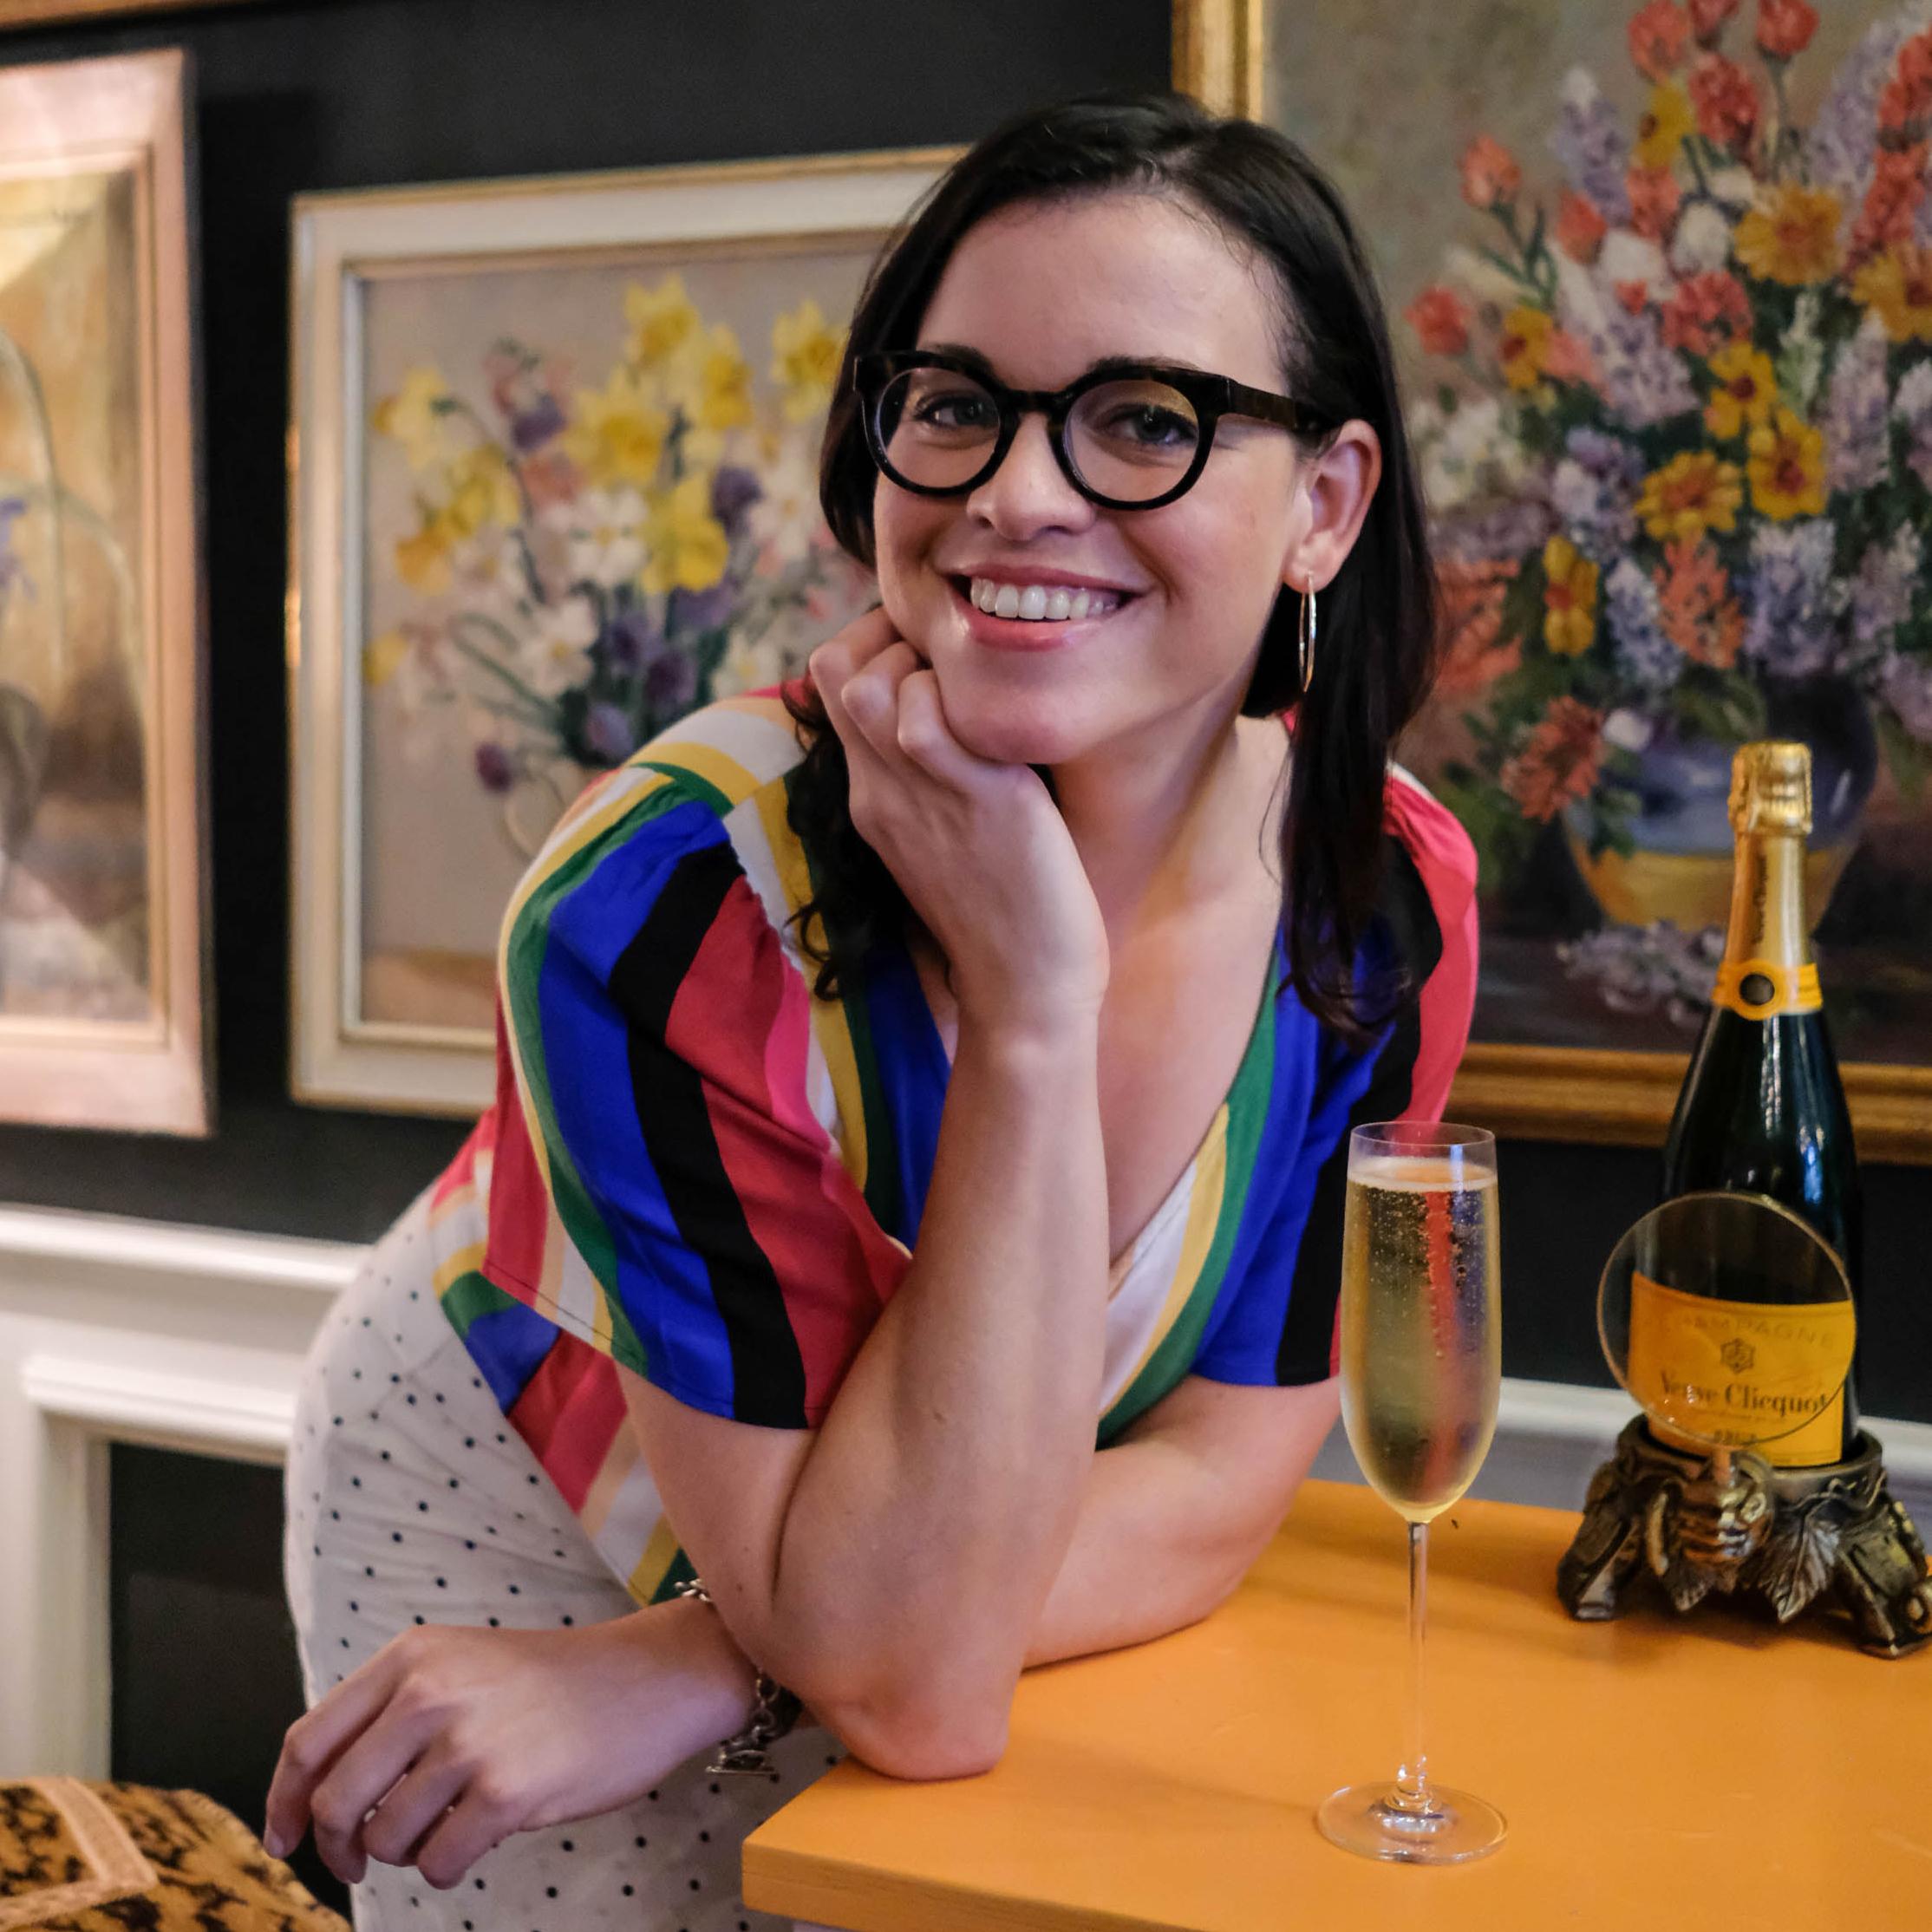 Joy Wilson (Joy The Baker)